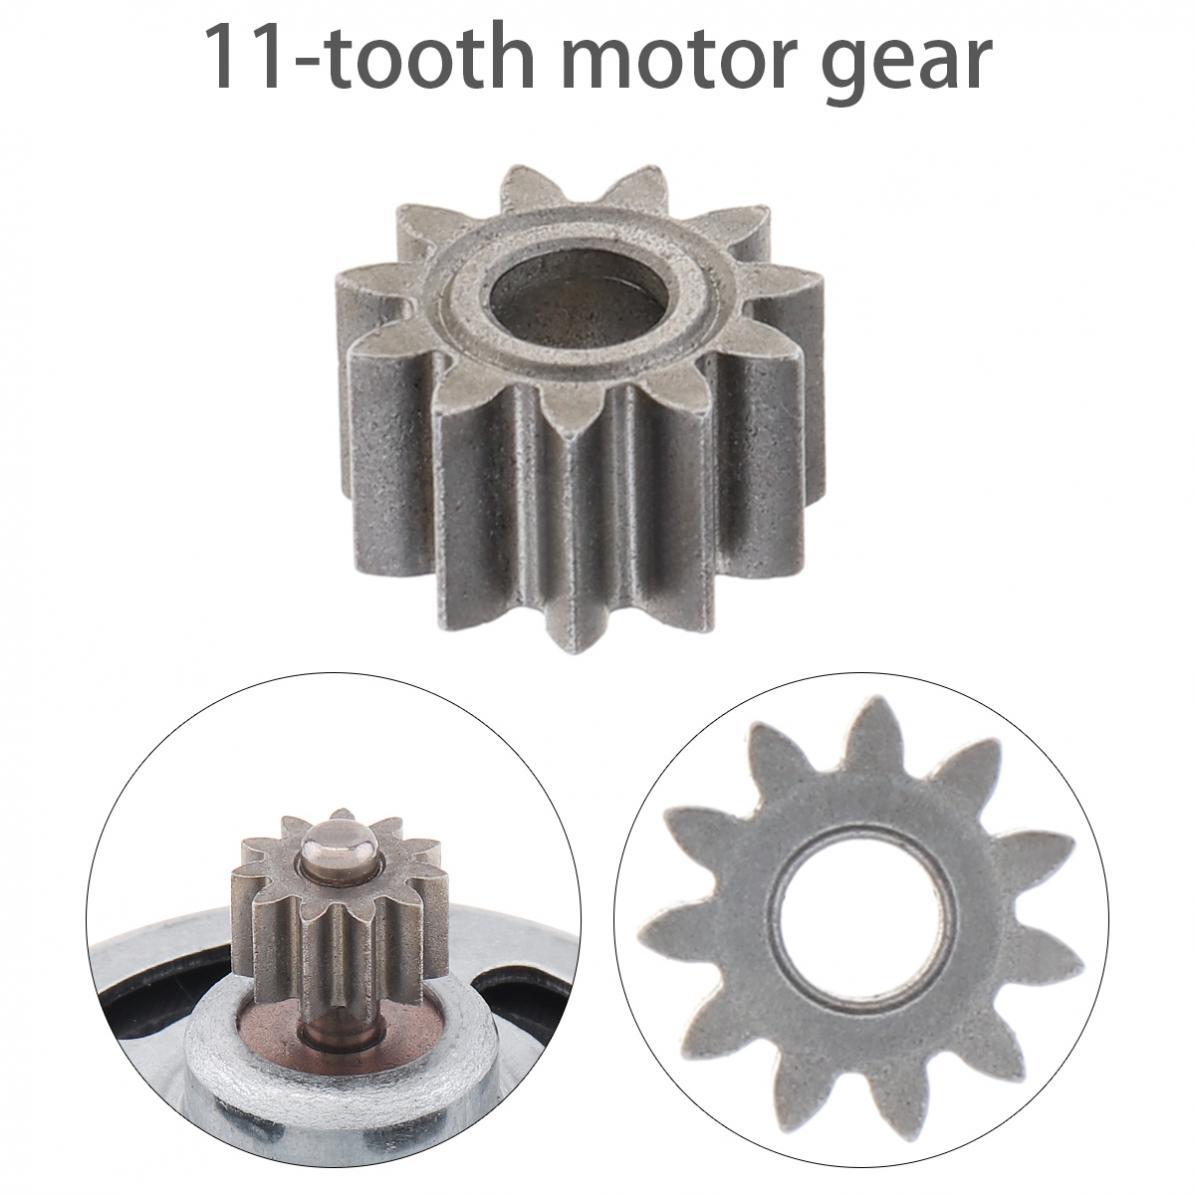 Motor Gear 1 Mod 11 Teeth Replaceable Motor Gear for RS550 10.8V / 12V / 14.4V / 16.8V / 18V / 21V DC Motor rs550 dc motor 12v 16 8v 21v 25v 19500 rpm dc motor two speed 9 12 teeth high torque gear box for electric drill screwdriver